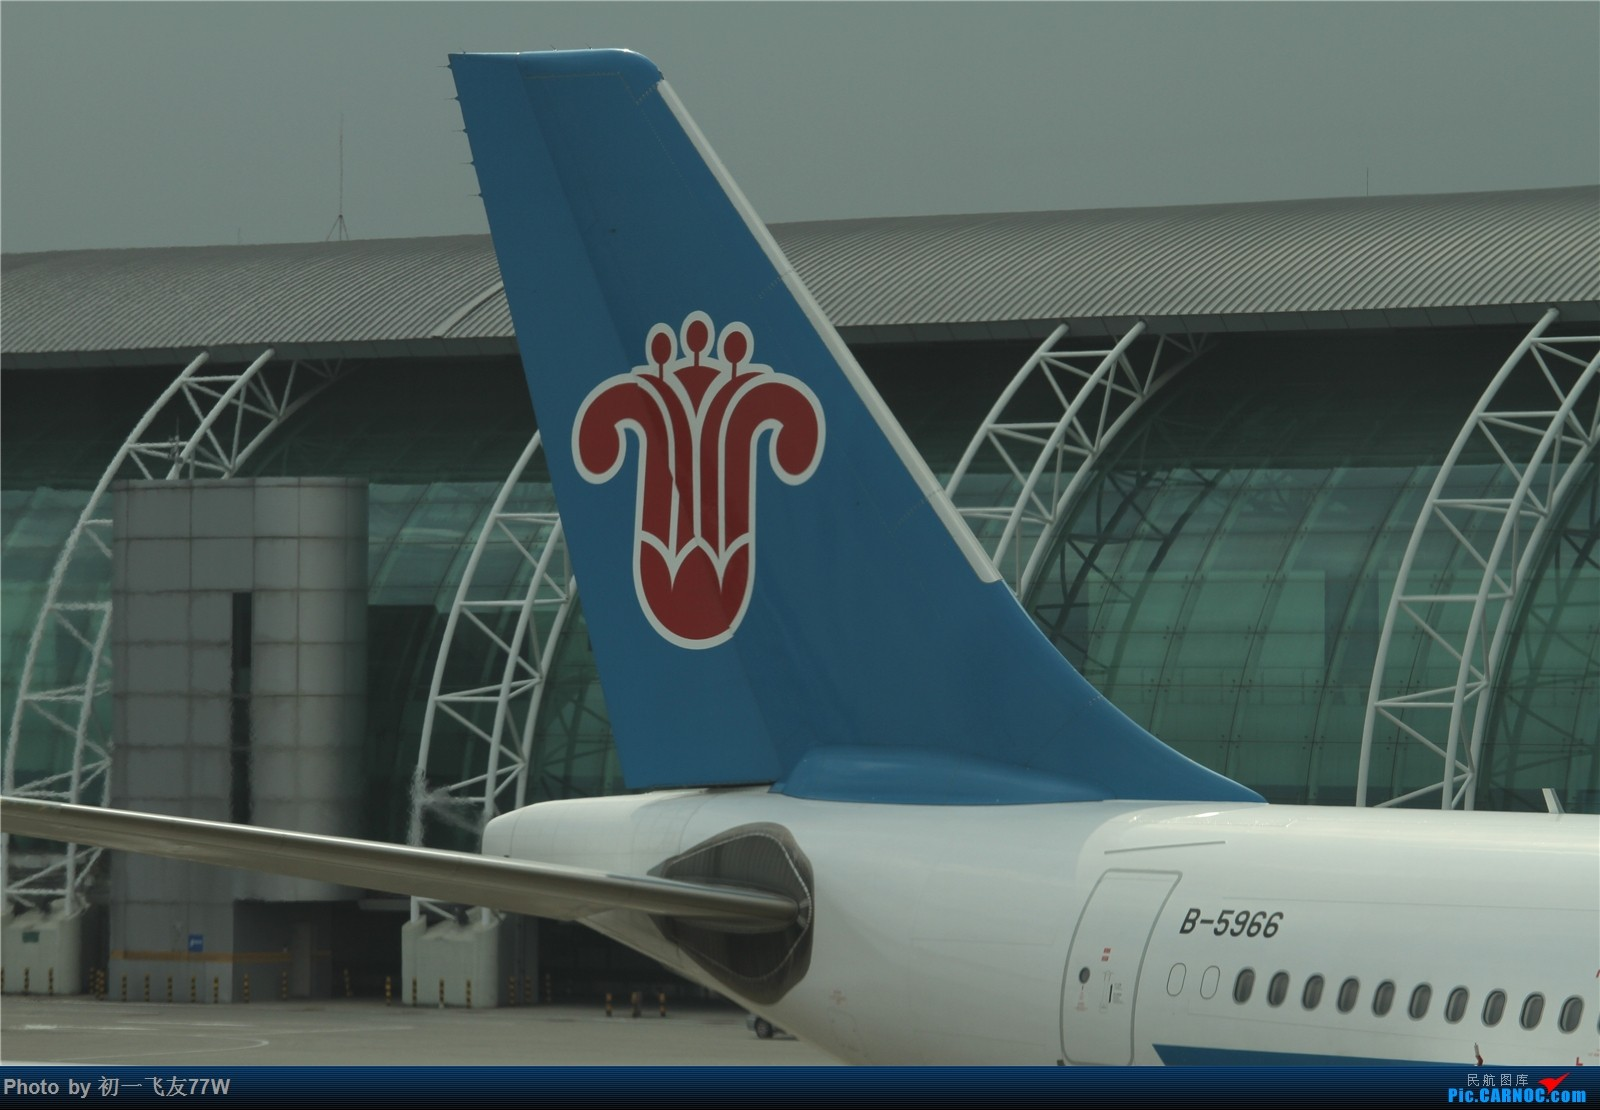 Re:[原创]【小吕游记第二季】马尔代夫往返,DHC-6水上飞机体验 BOEING 737-800 B-5618